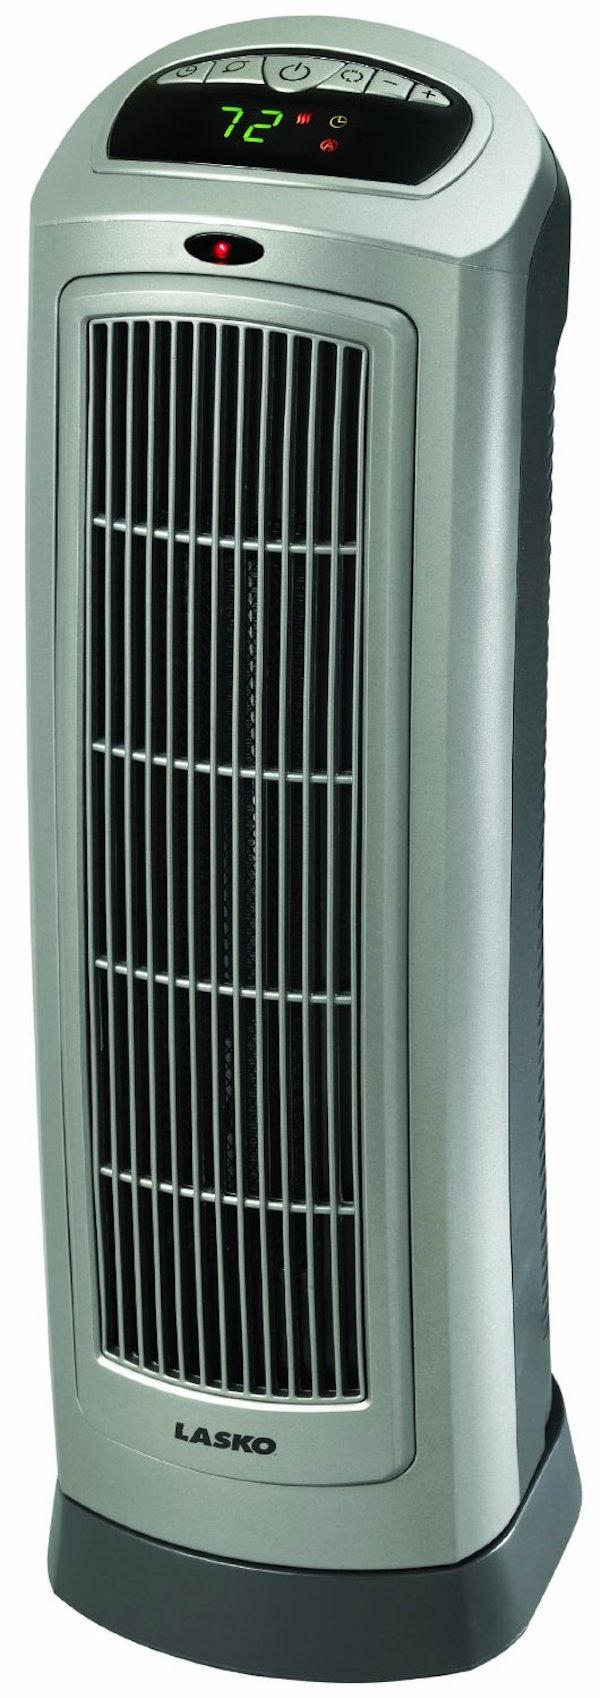 Lasko 755320 Ceramic Tower Heater. Amazon Buy